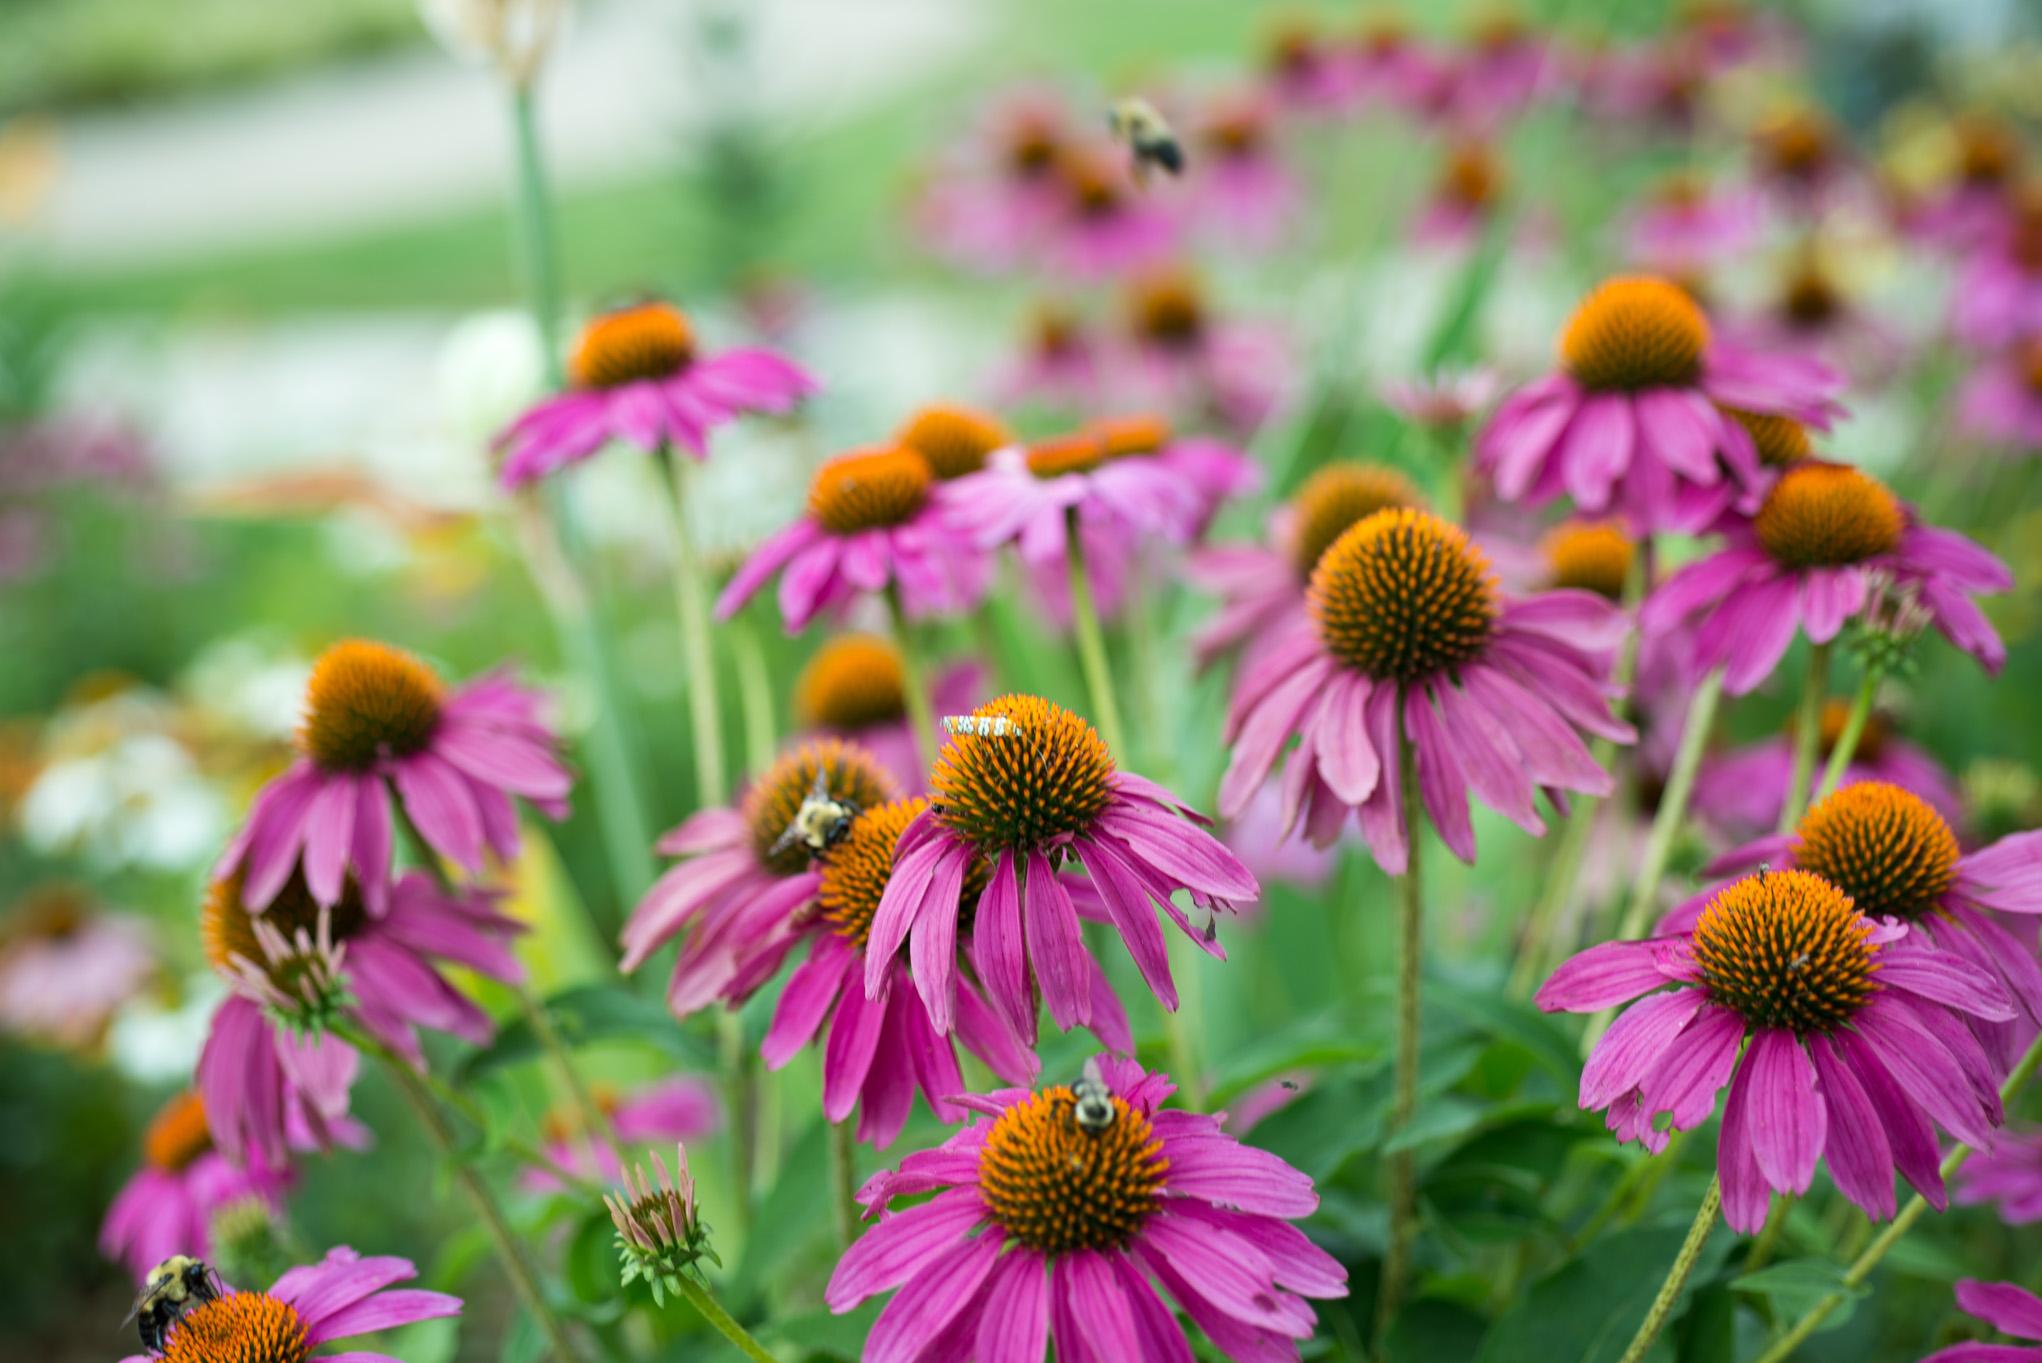 A few wildflowers.